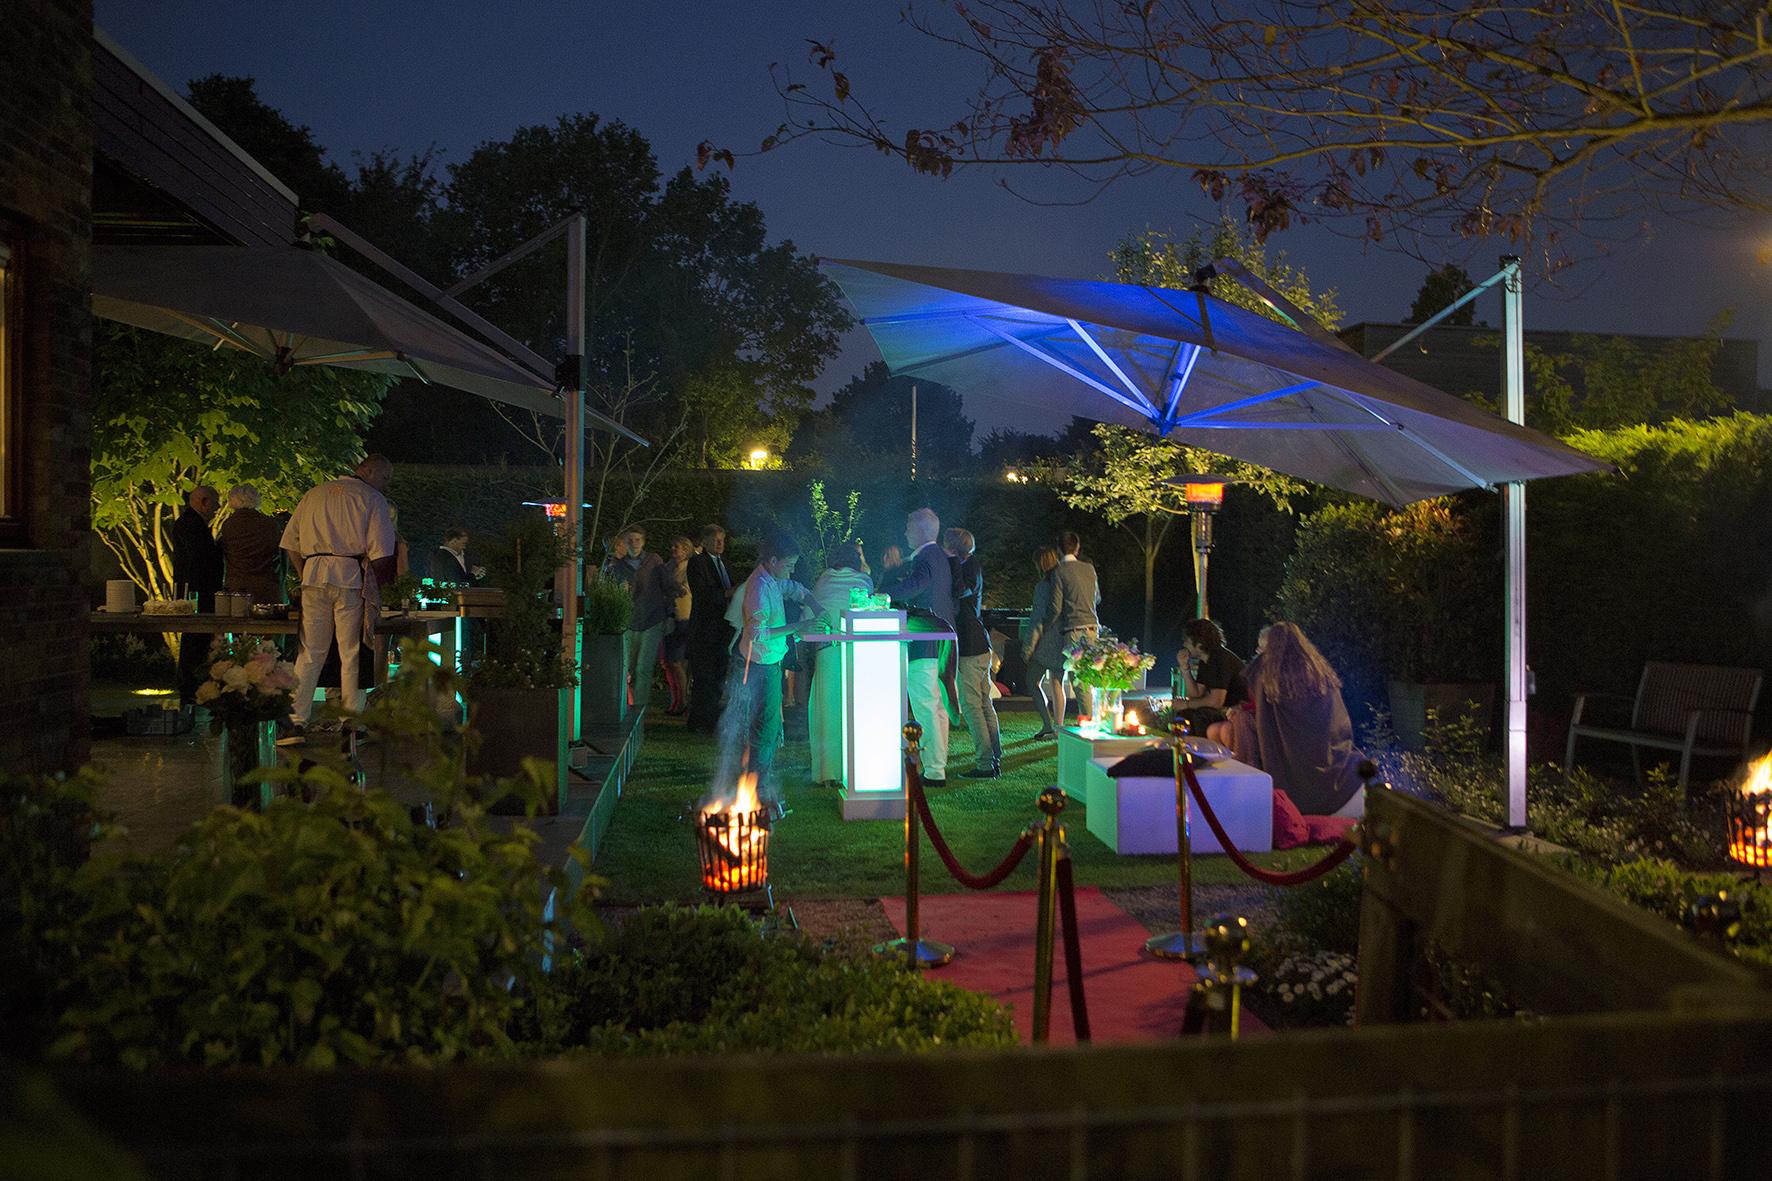 Feest in Rottredam